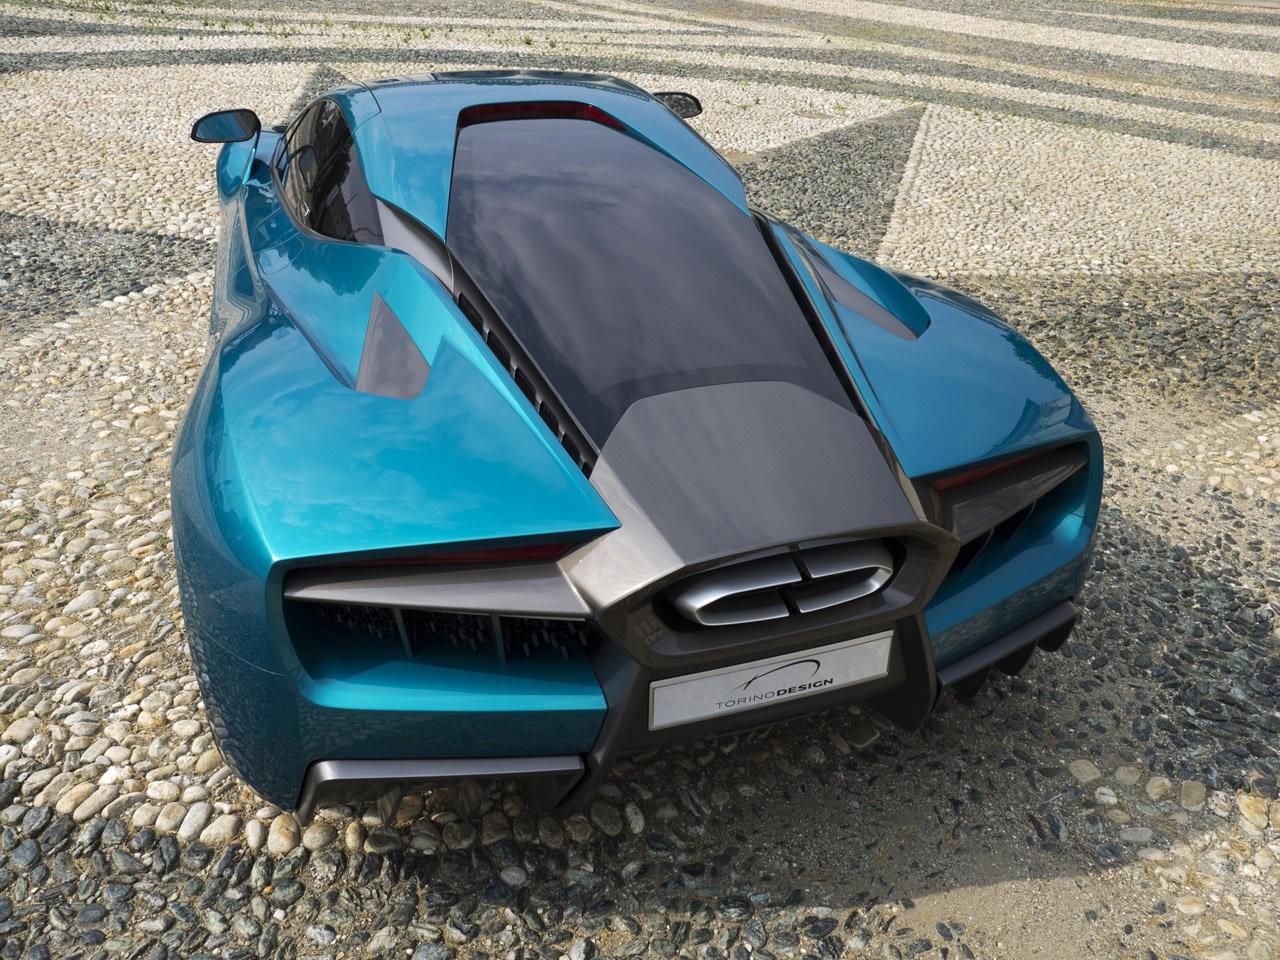 torino-design-ats-wildtwelve-concept-0-100-3